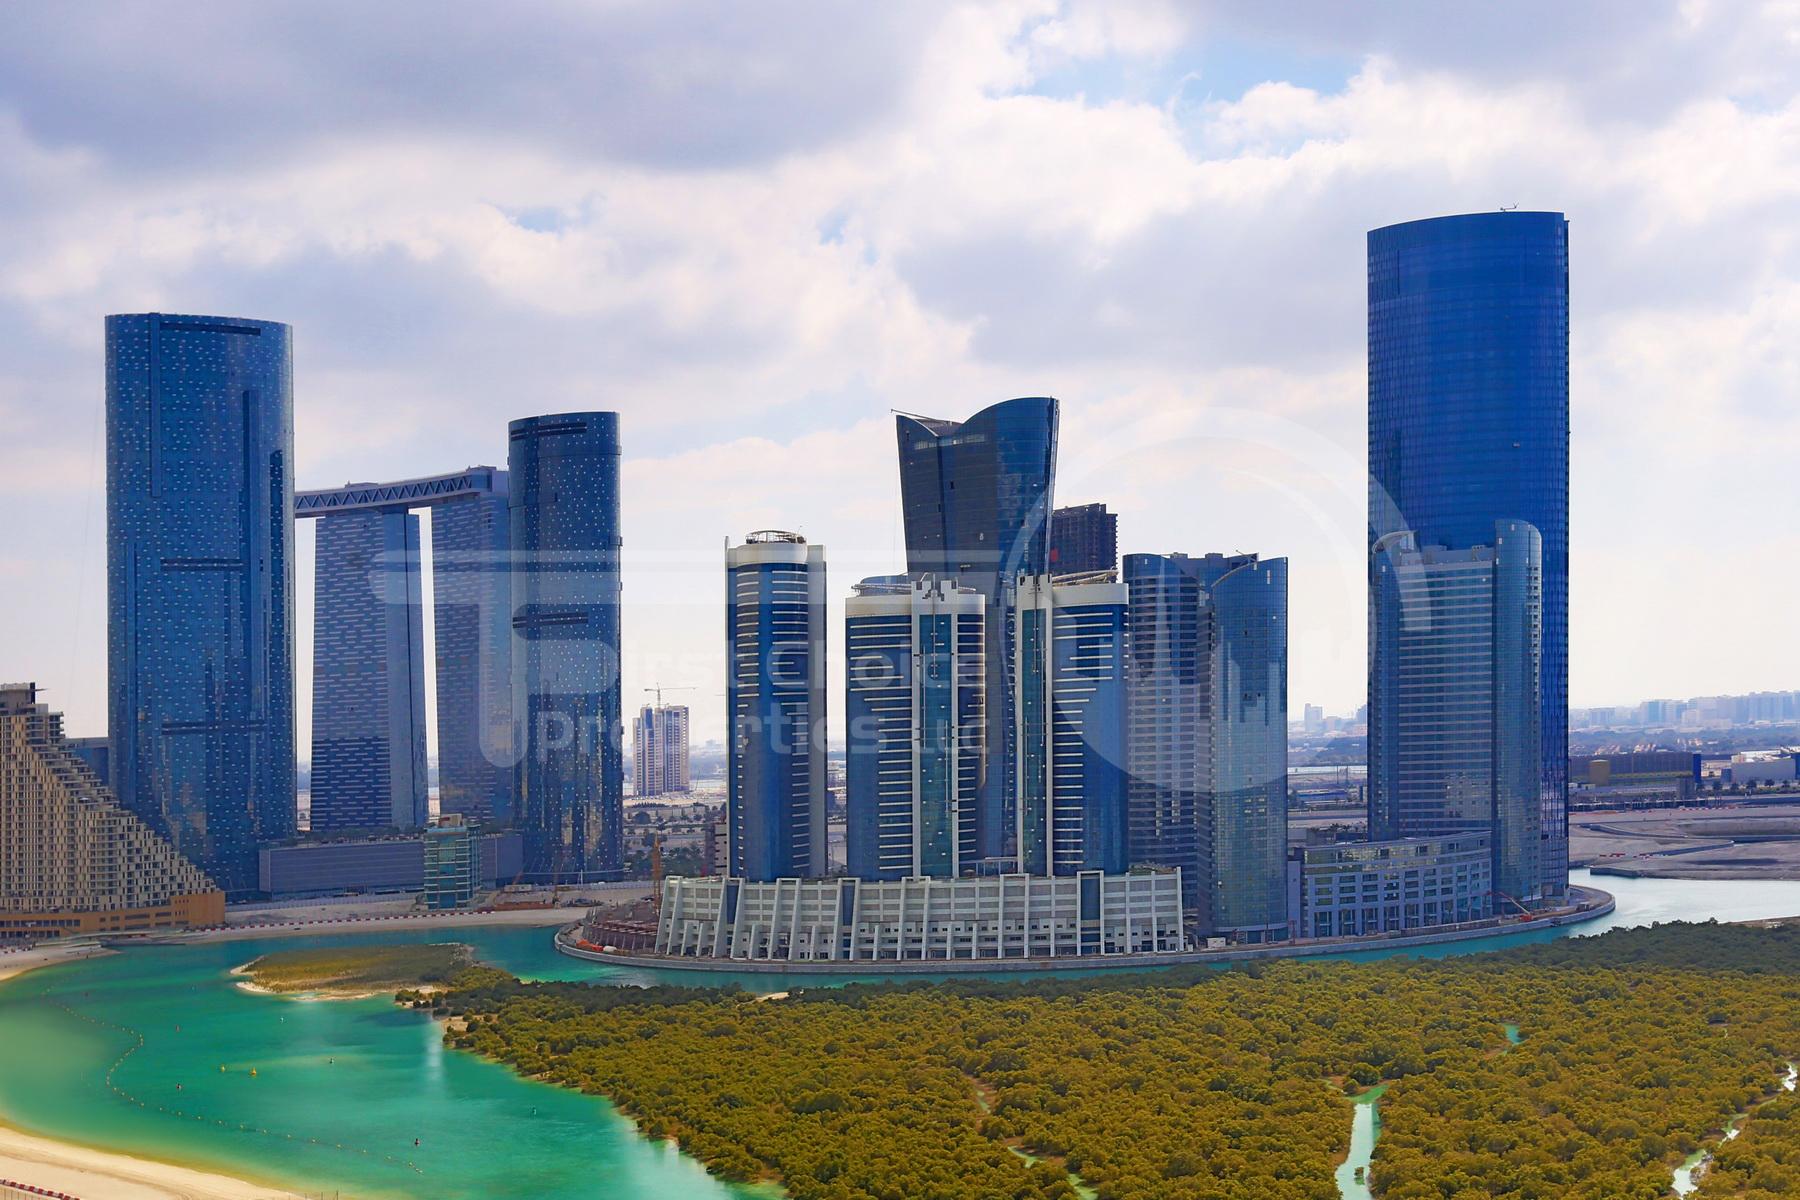 Studio - 1BR - 2BR - 3BR - 4BR Apartment - Abu Dhabi - UAE - Al Reem Island - Hydra Avenue - Outside View (60).JPG